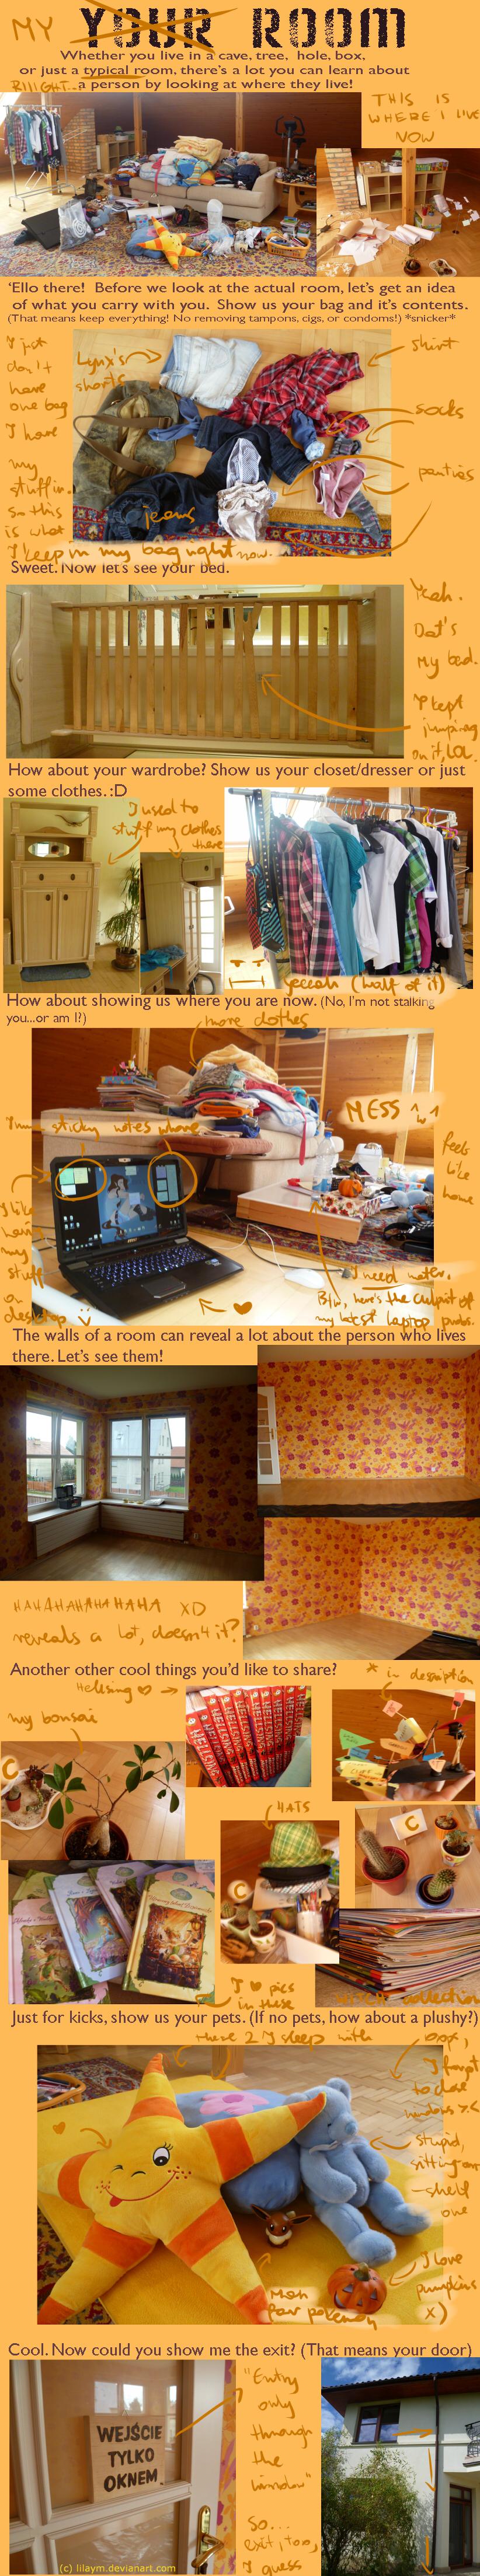 Mah room is awsome - meme by LilayM